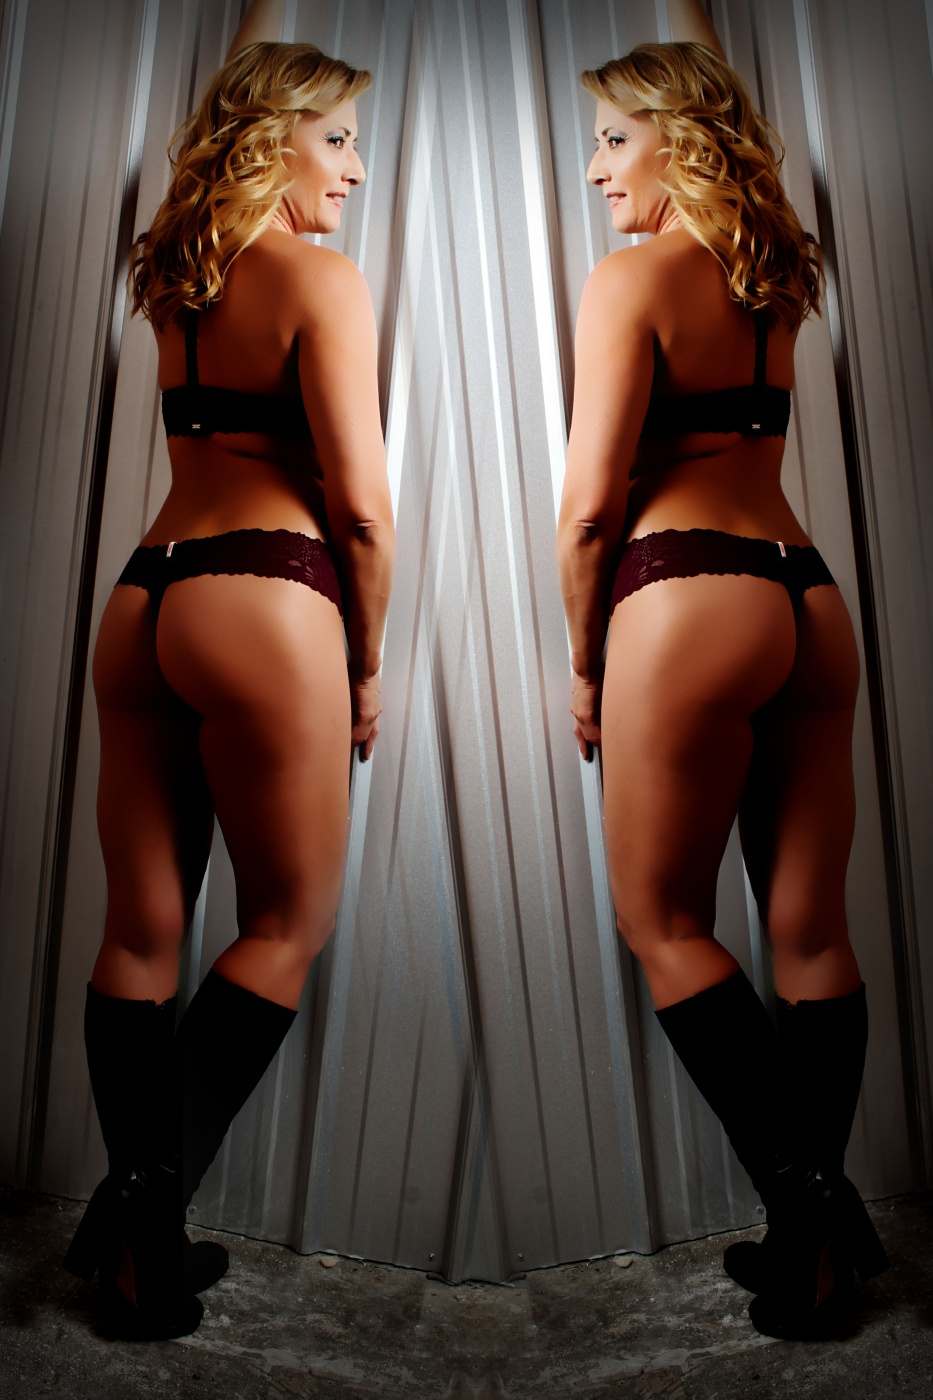 Kyra Knight